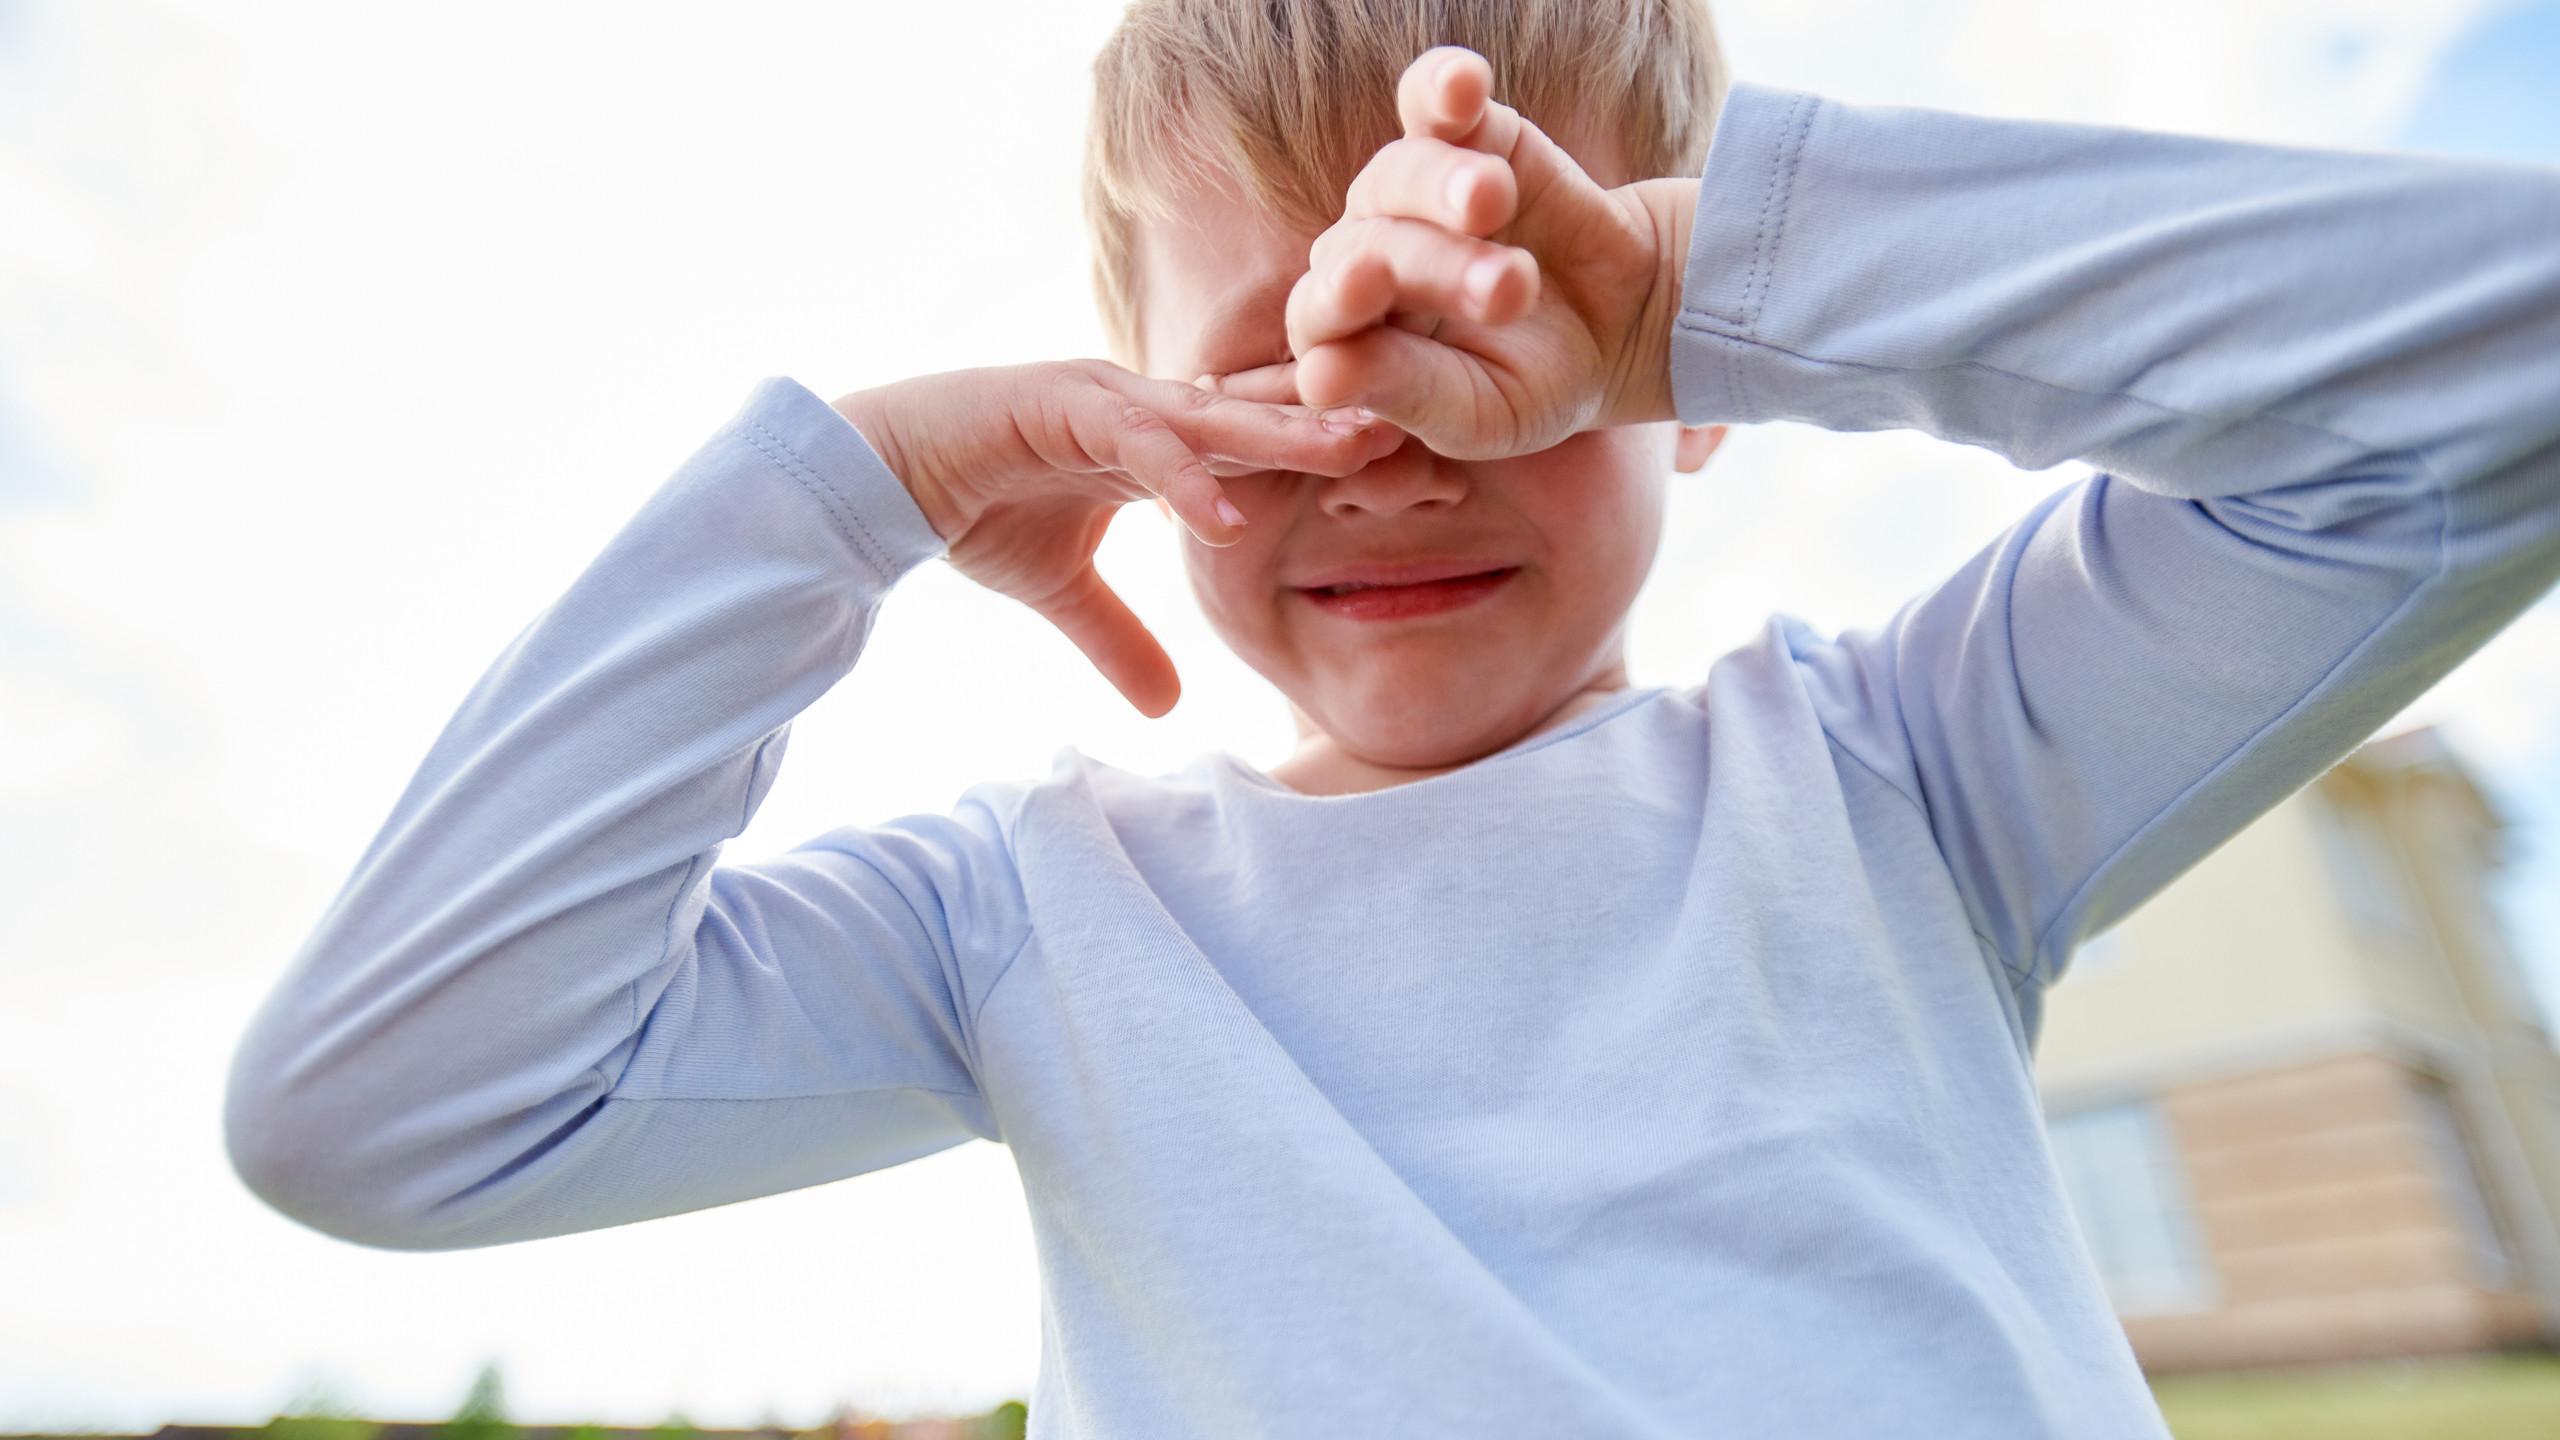 crying-little-boy-on-playground-Y32QUZ7.